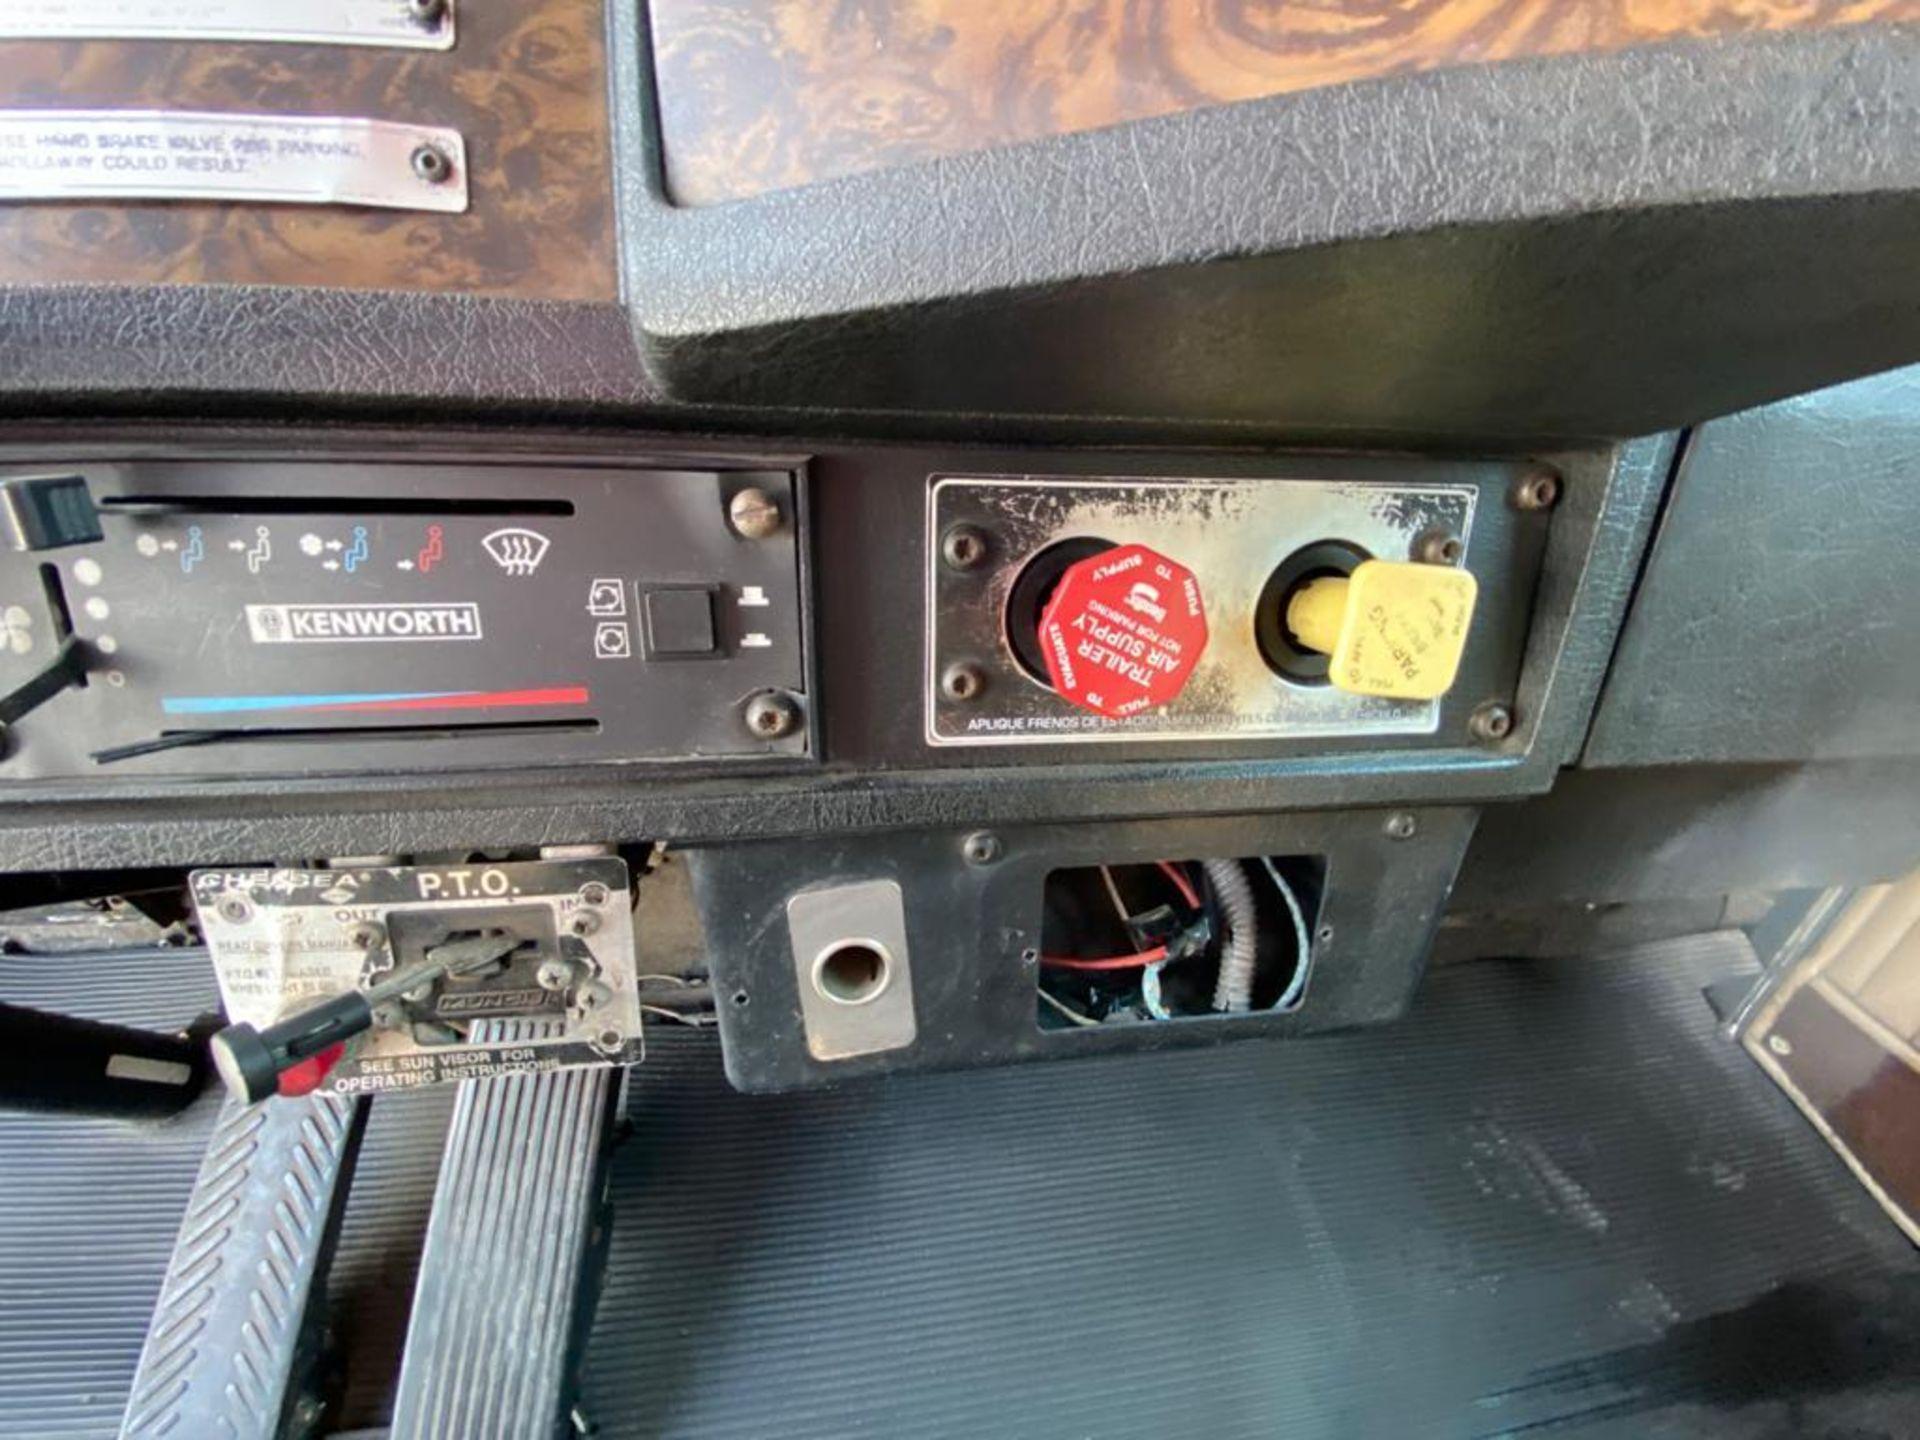 1999 Kenworth Sleeper truck tractor, standard transmission of 18 speeds - Image 38 of 72